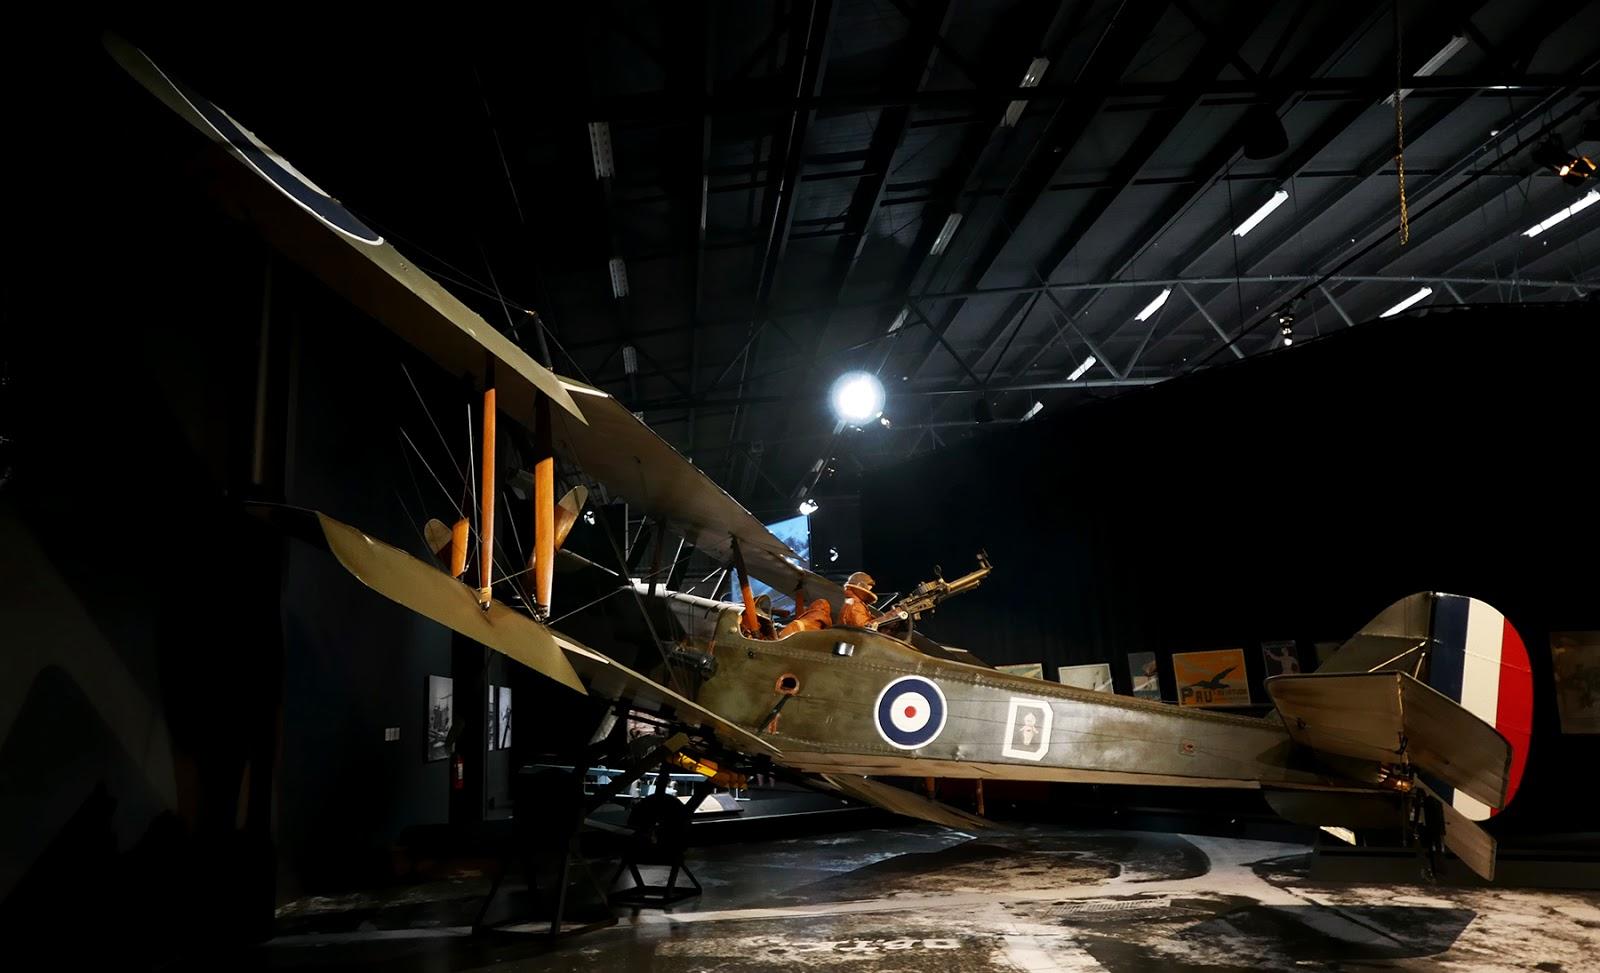 Euriental   luxury travel & style   Omaka Aviation Heritage Centre, New Zealand